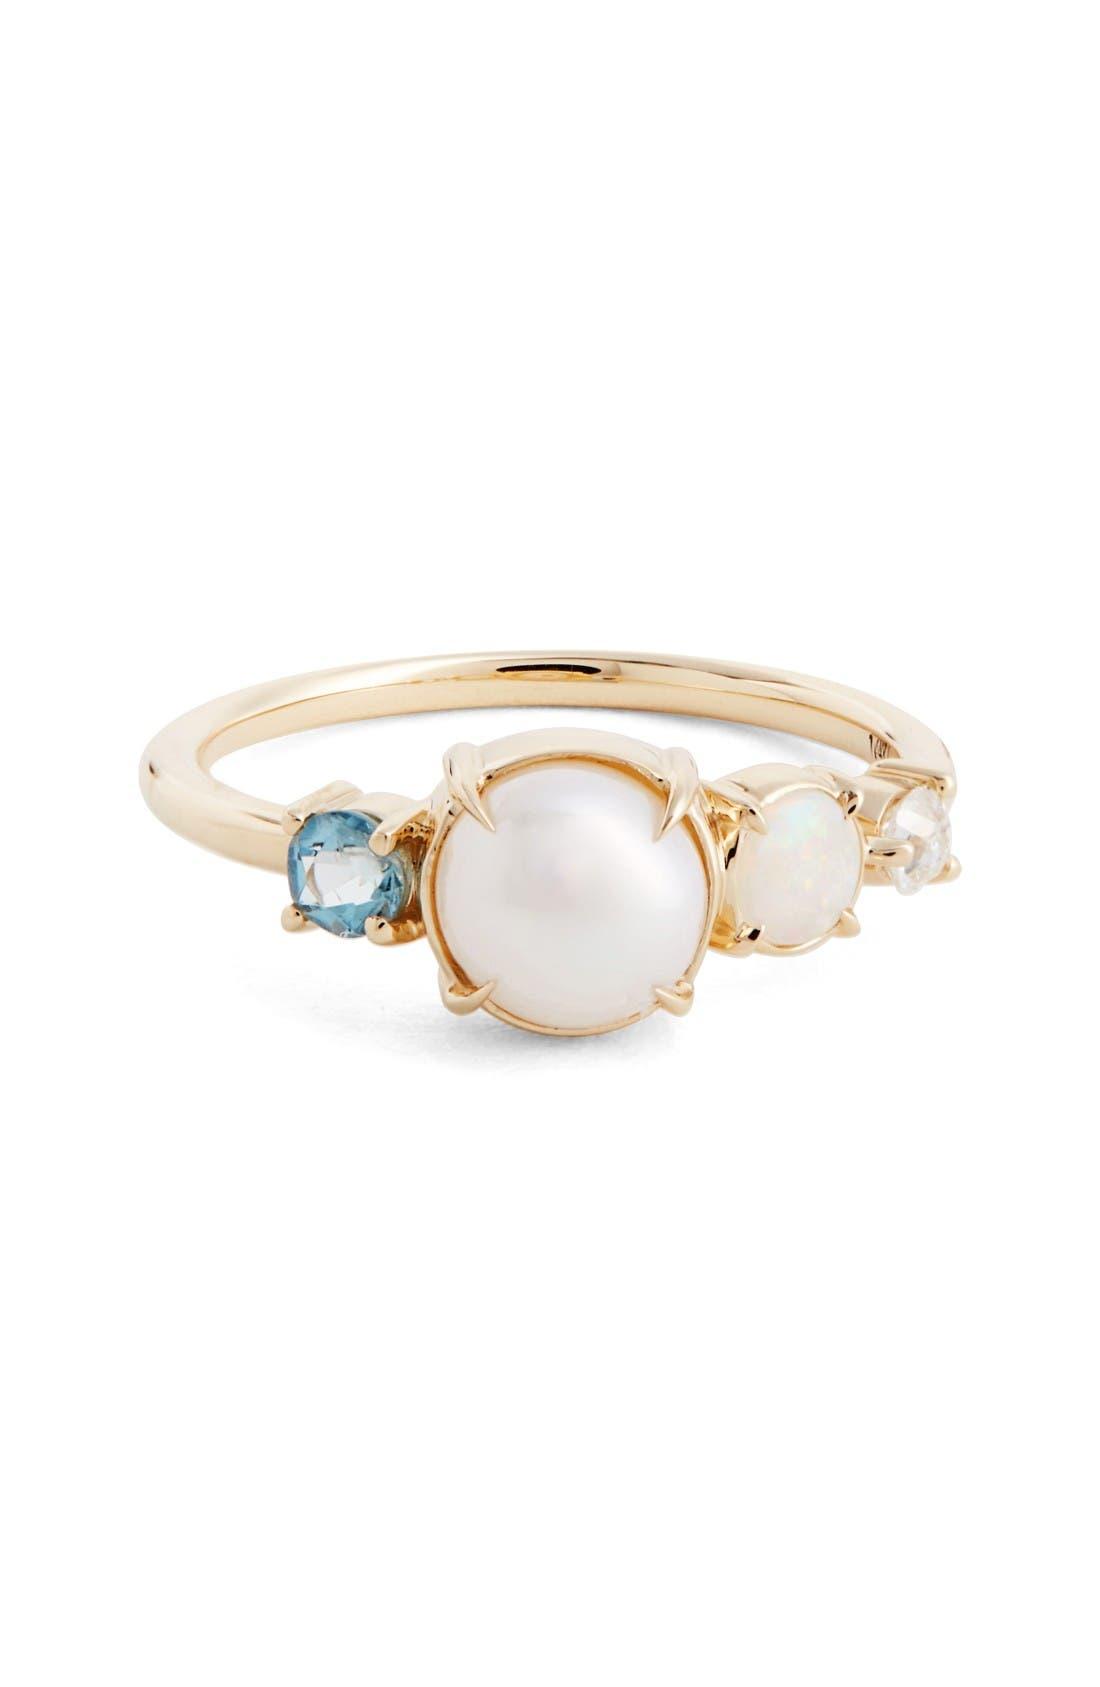 MOCIUN Pearl, Opal, Aquamarine & Diamond Ring